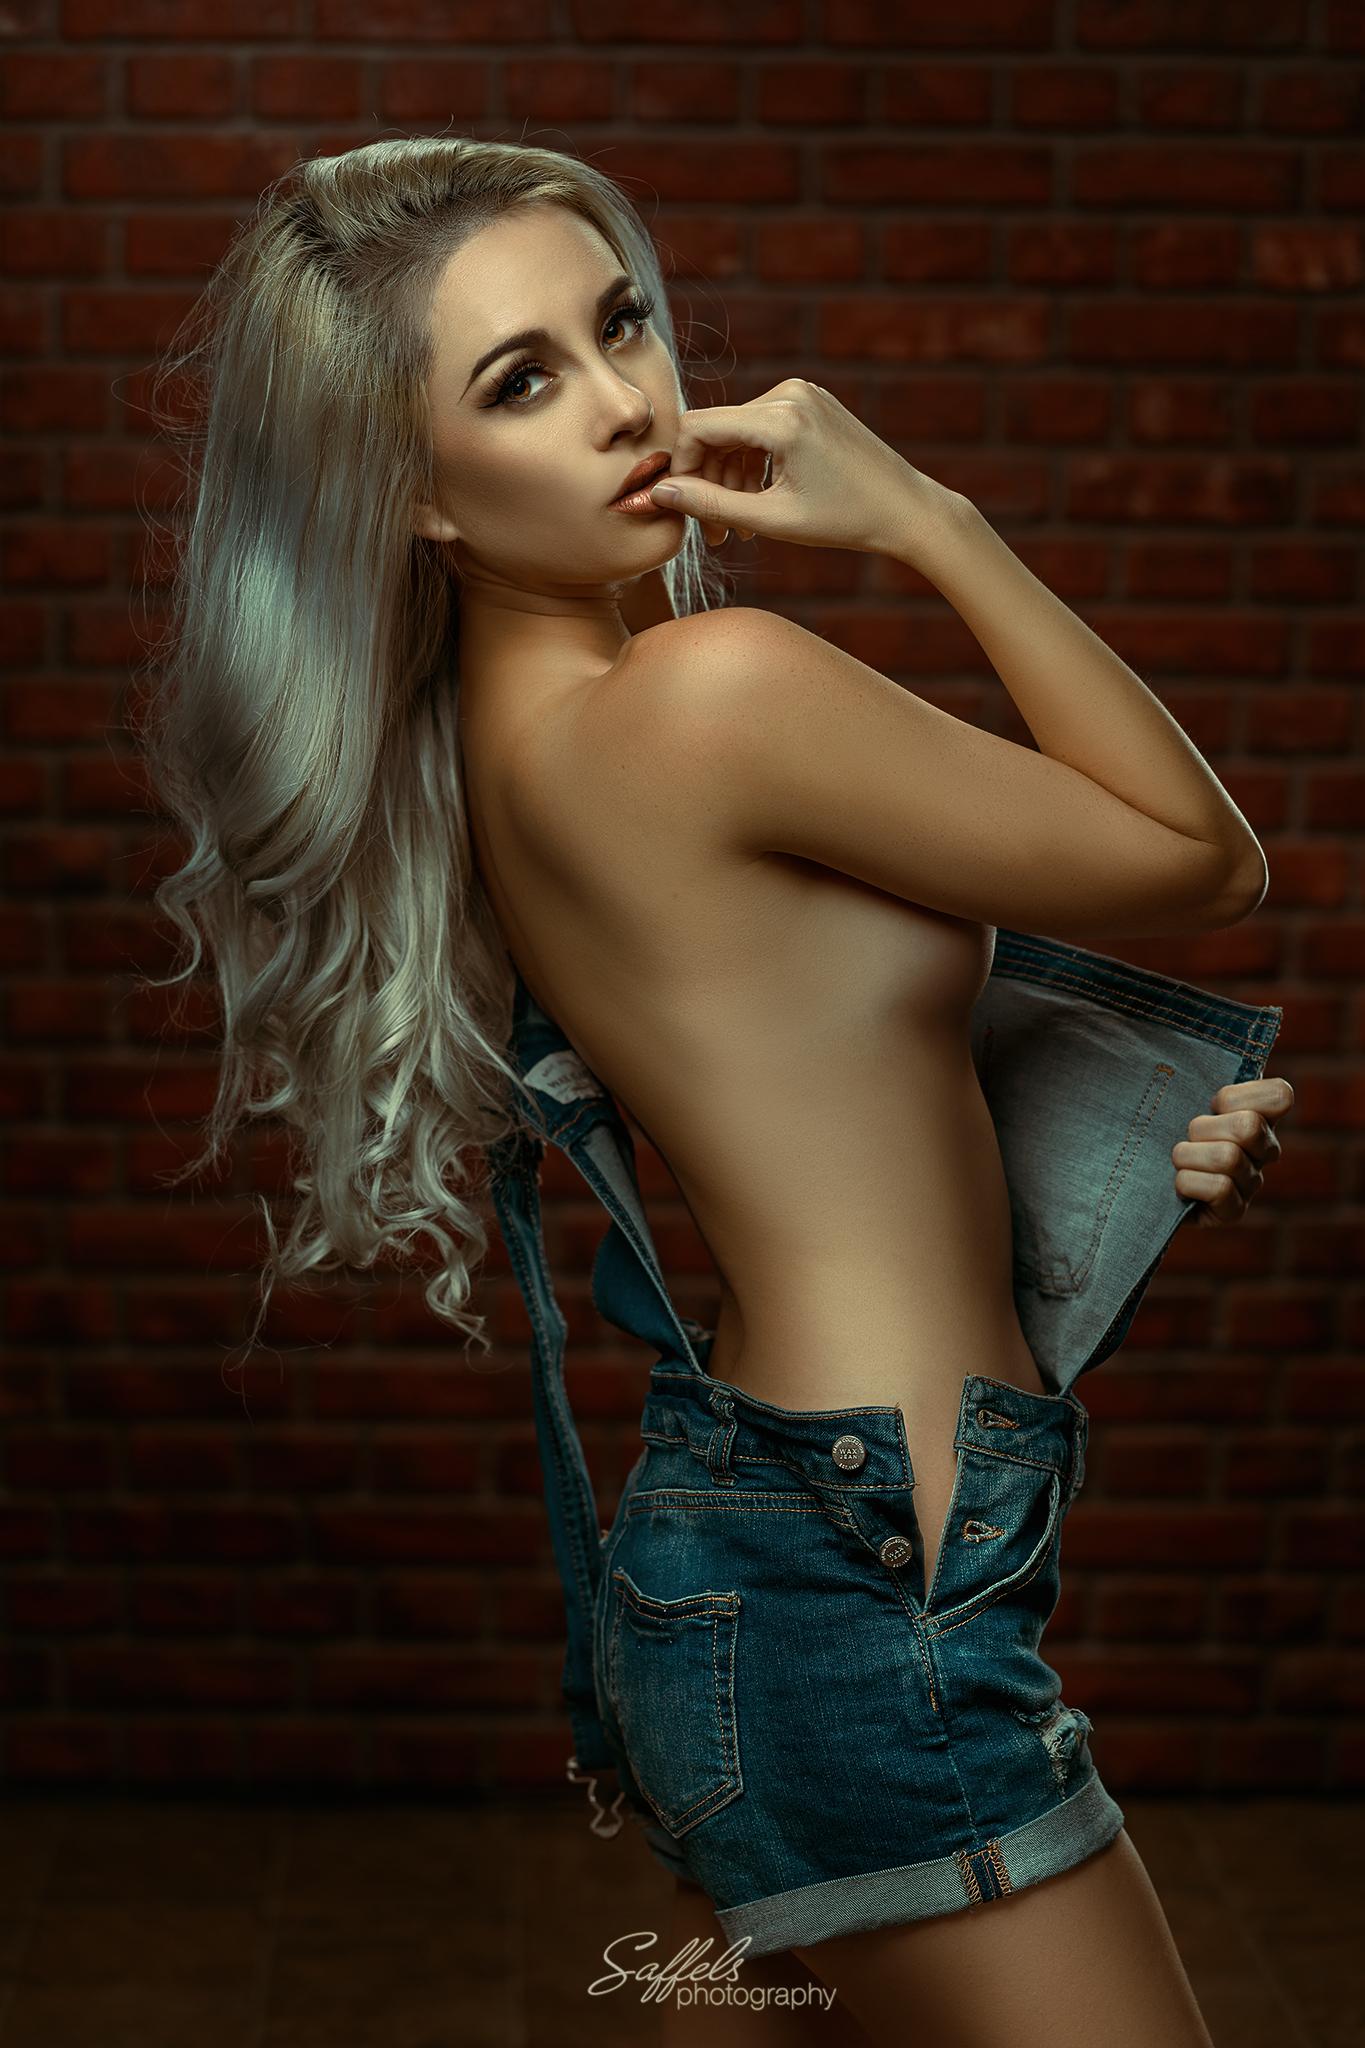 Sexy Overalls mini set